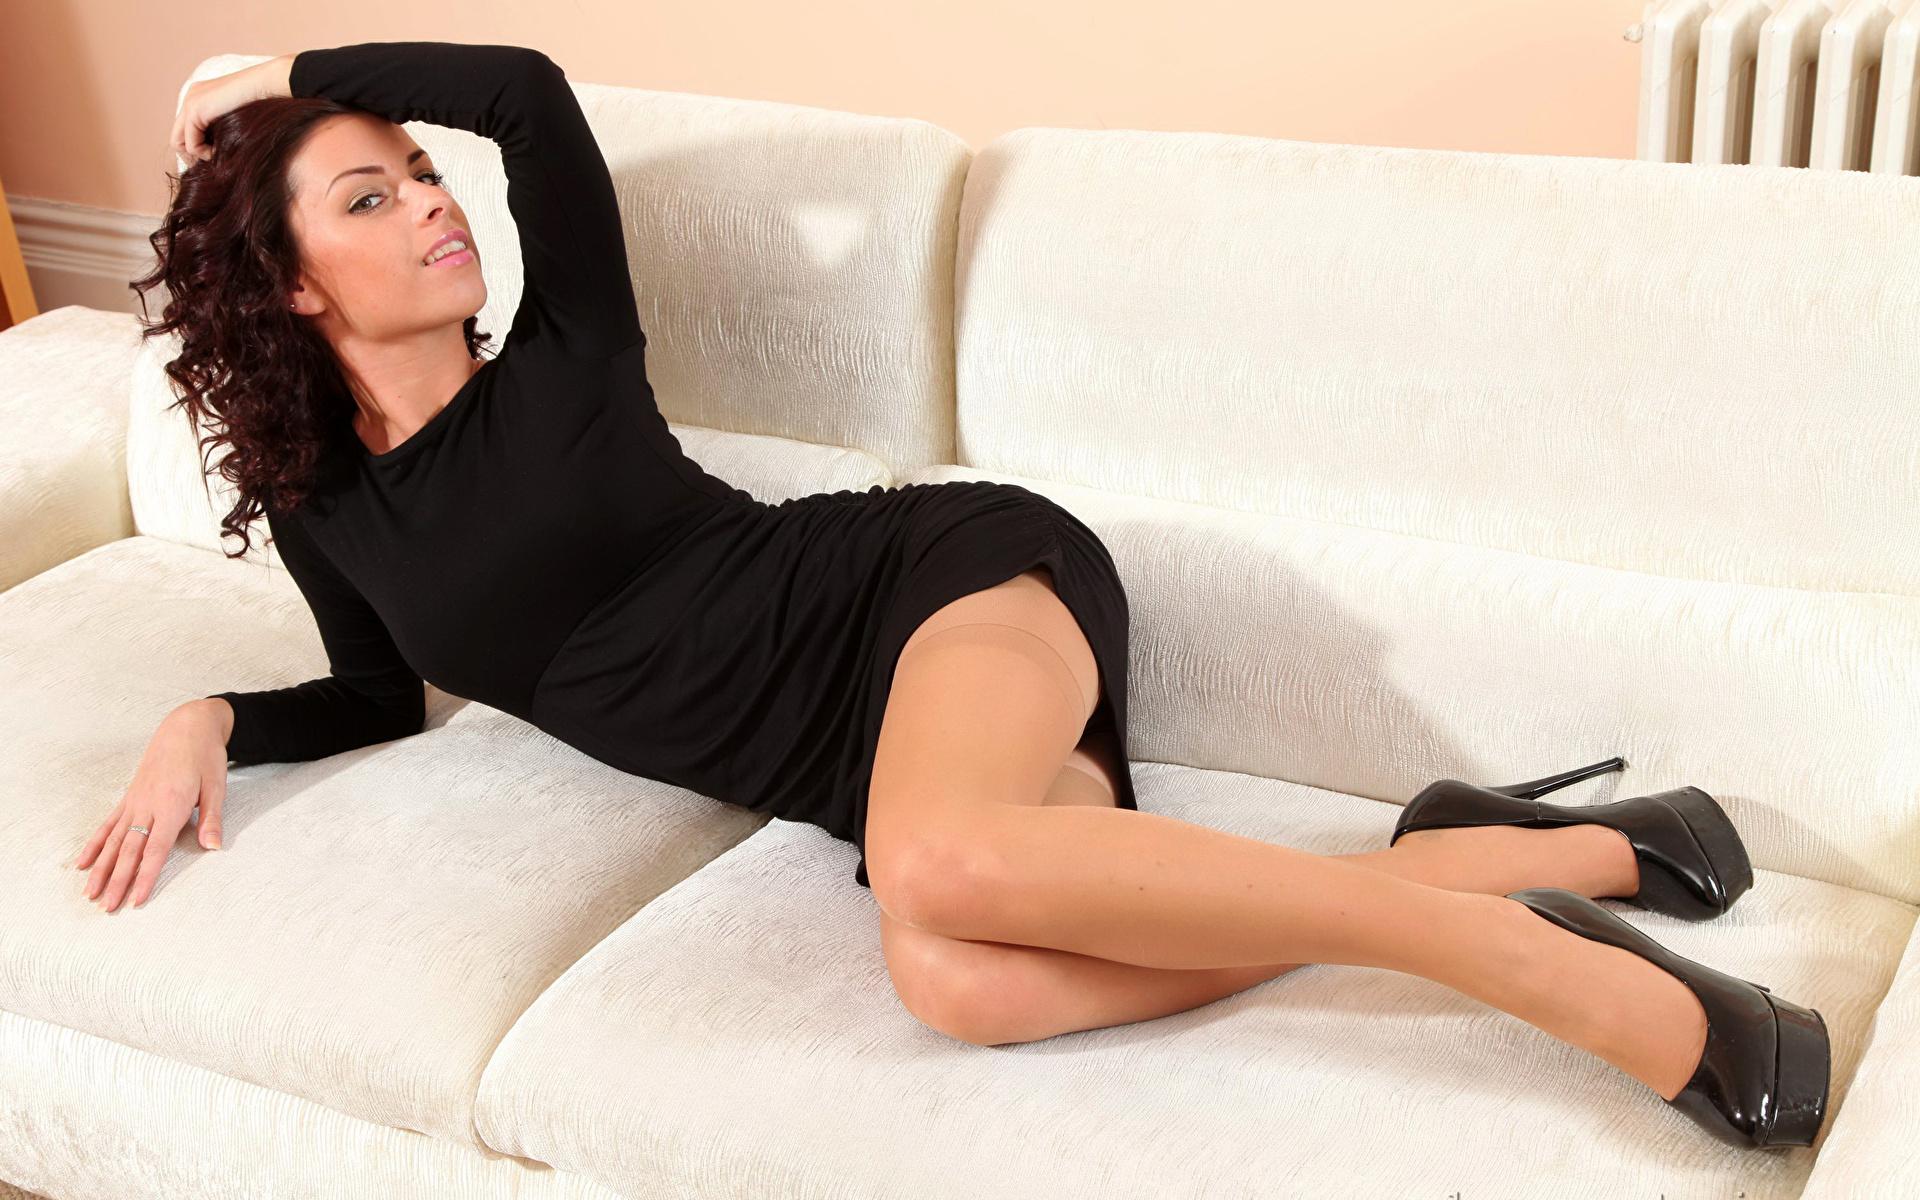 Undressing action from a brunette milf babe in high heels Shelly Jones № 916674 загрузить